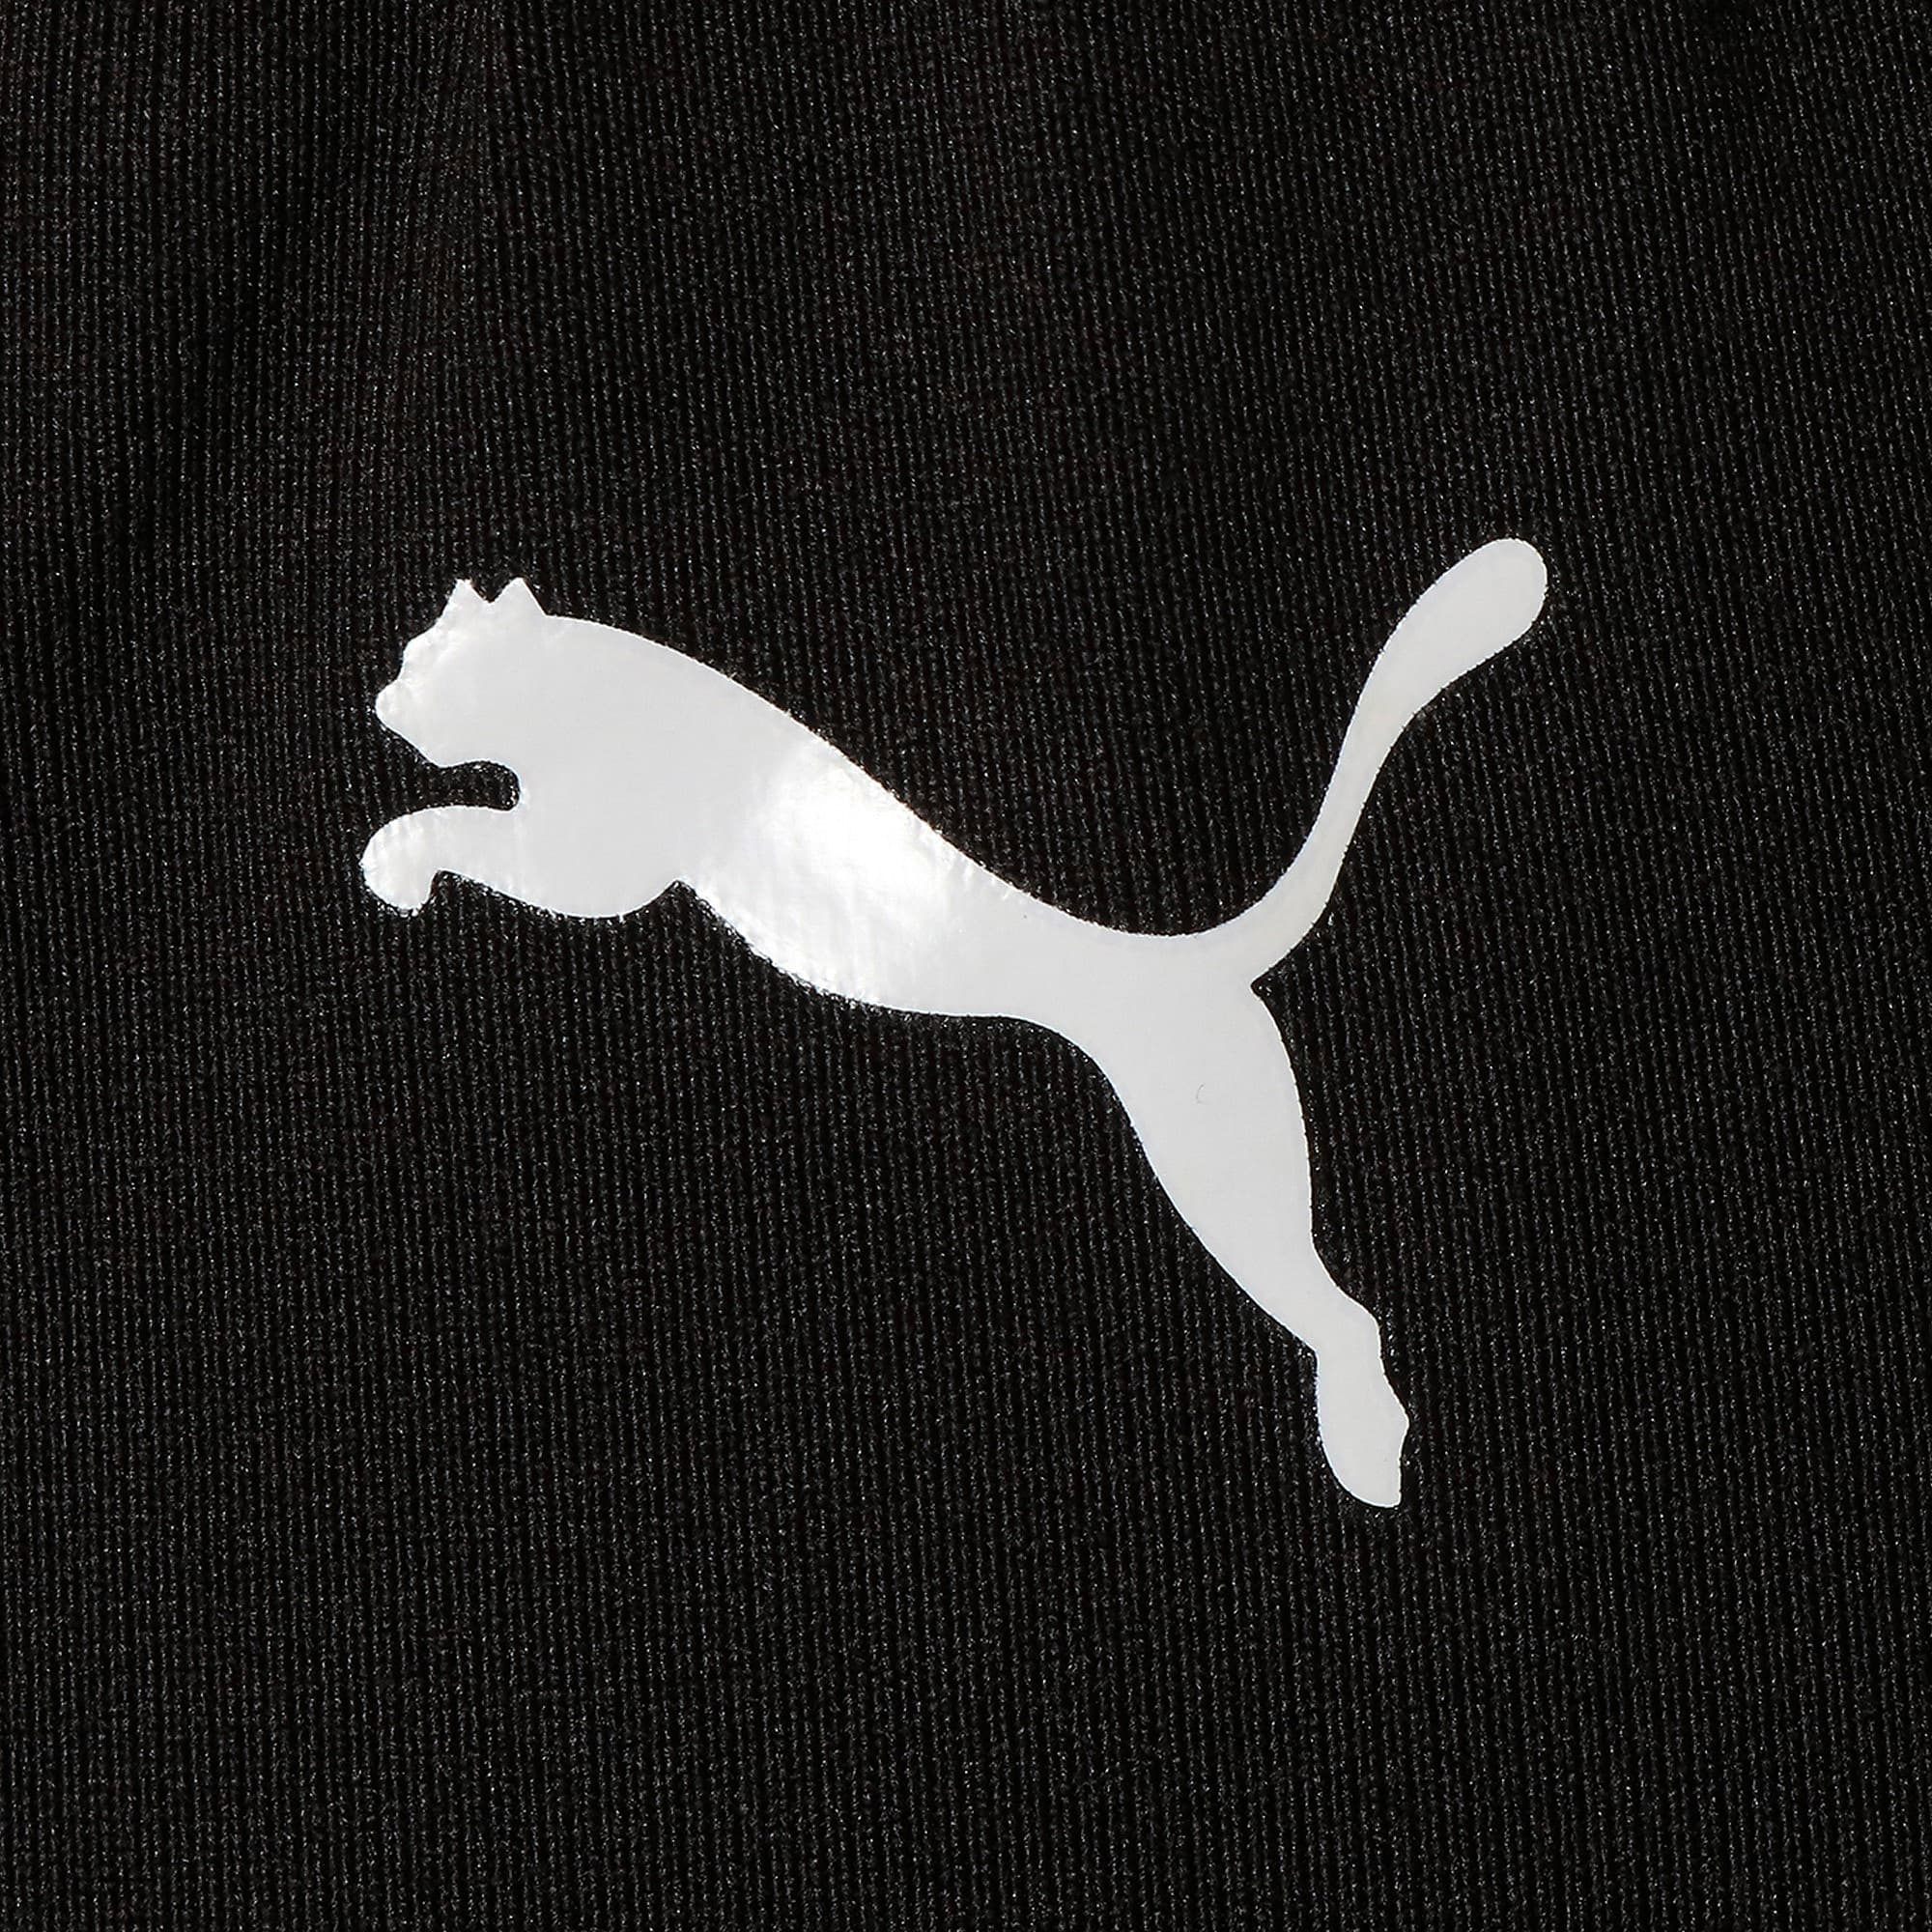 Thumbnail 4 of A.C.E. レディ ウィメンズ パンツ, Puma Black, medium-JPN